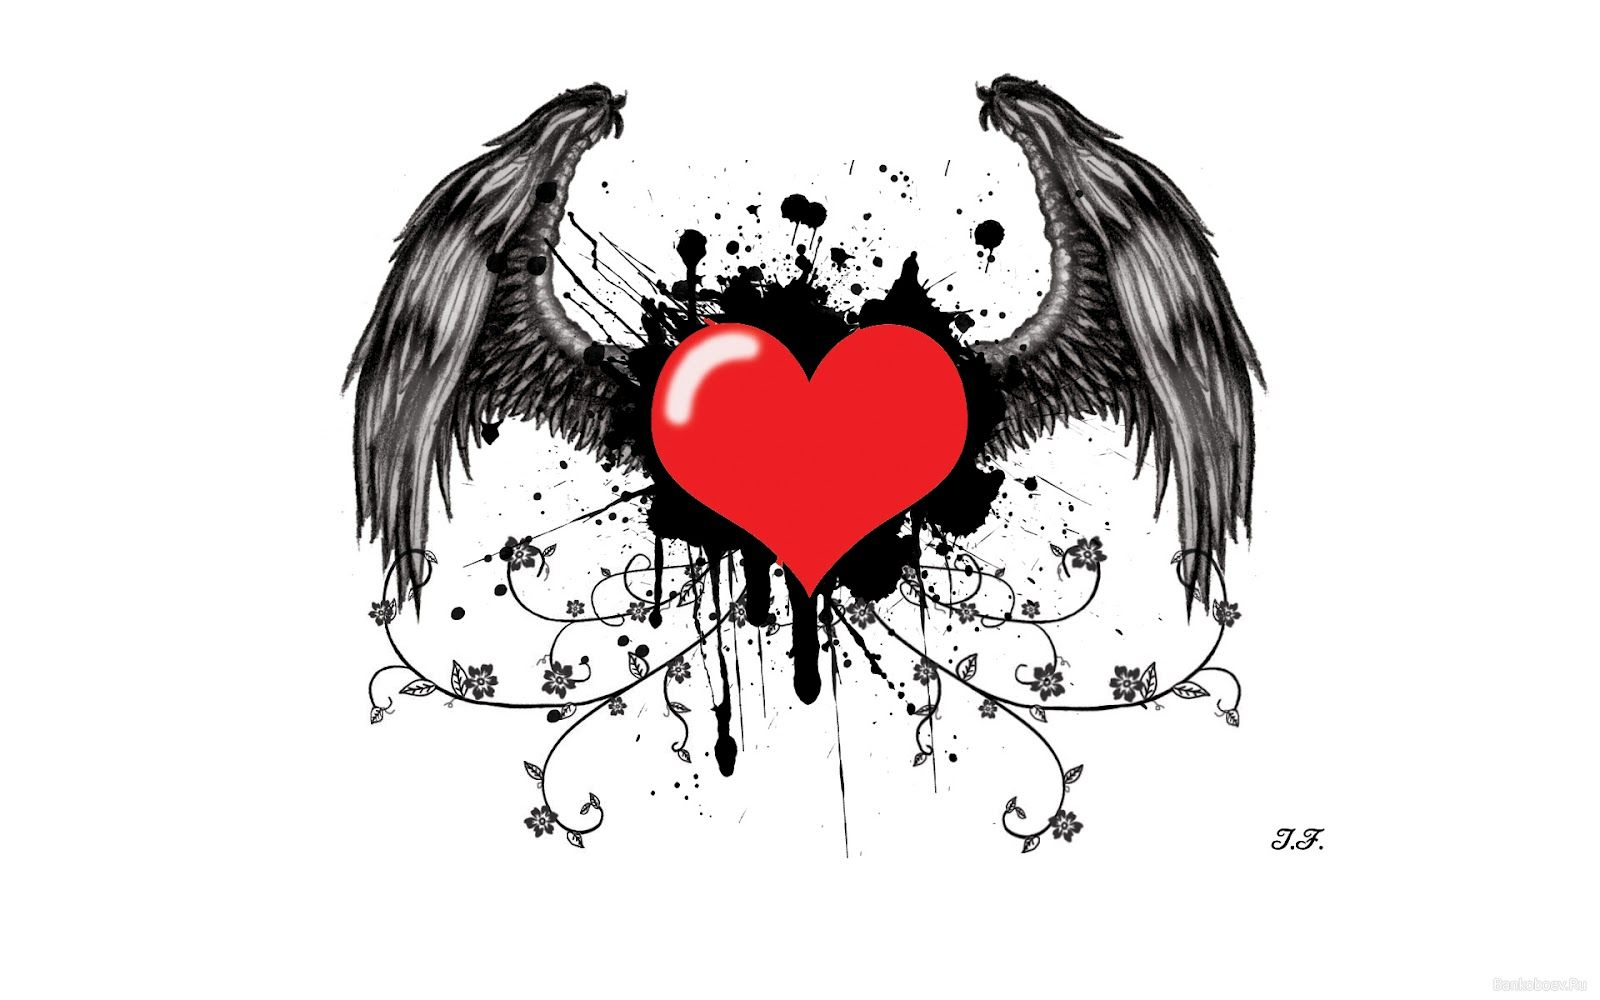 Tatuajes De Corazones Con Alas 3 Propuestas Alas Tatoo Corazon